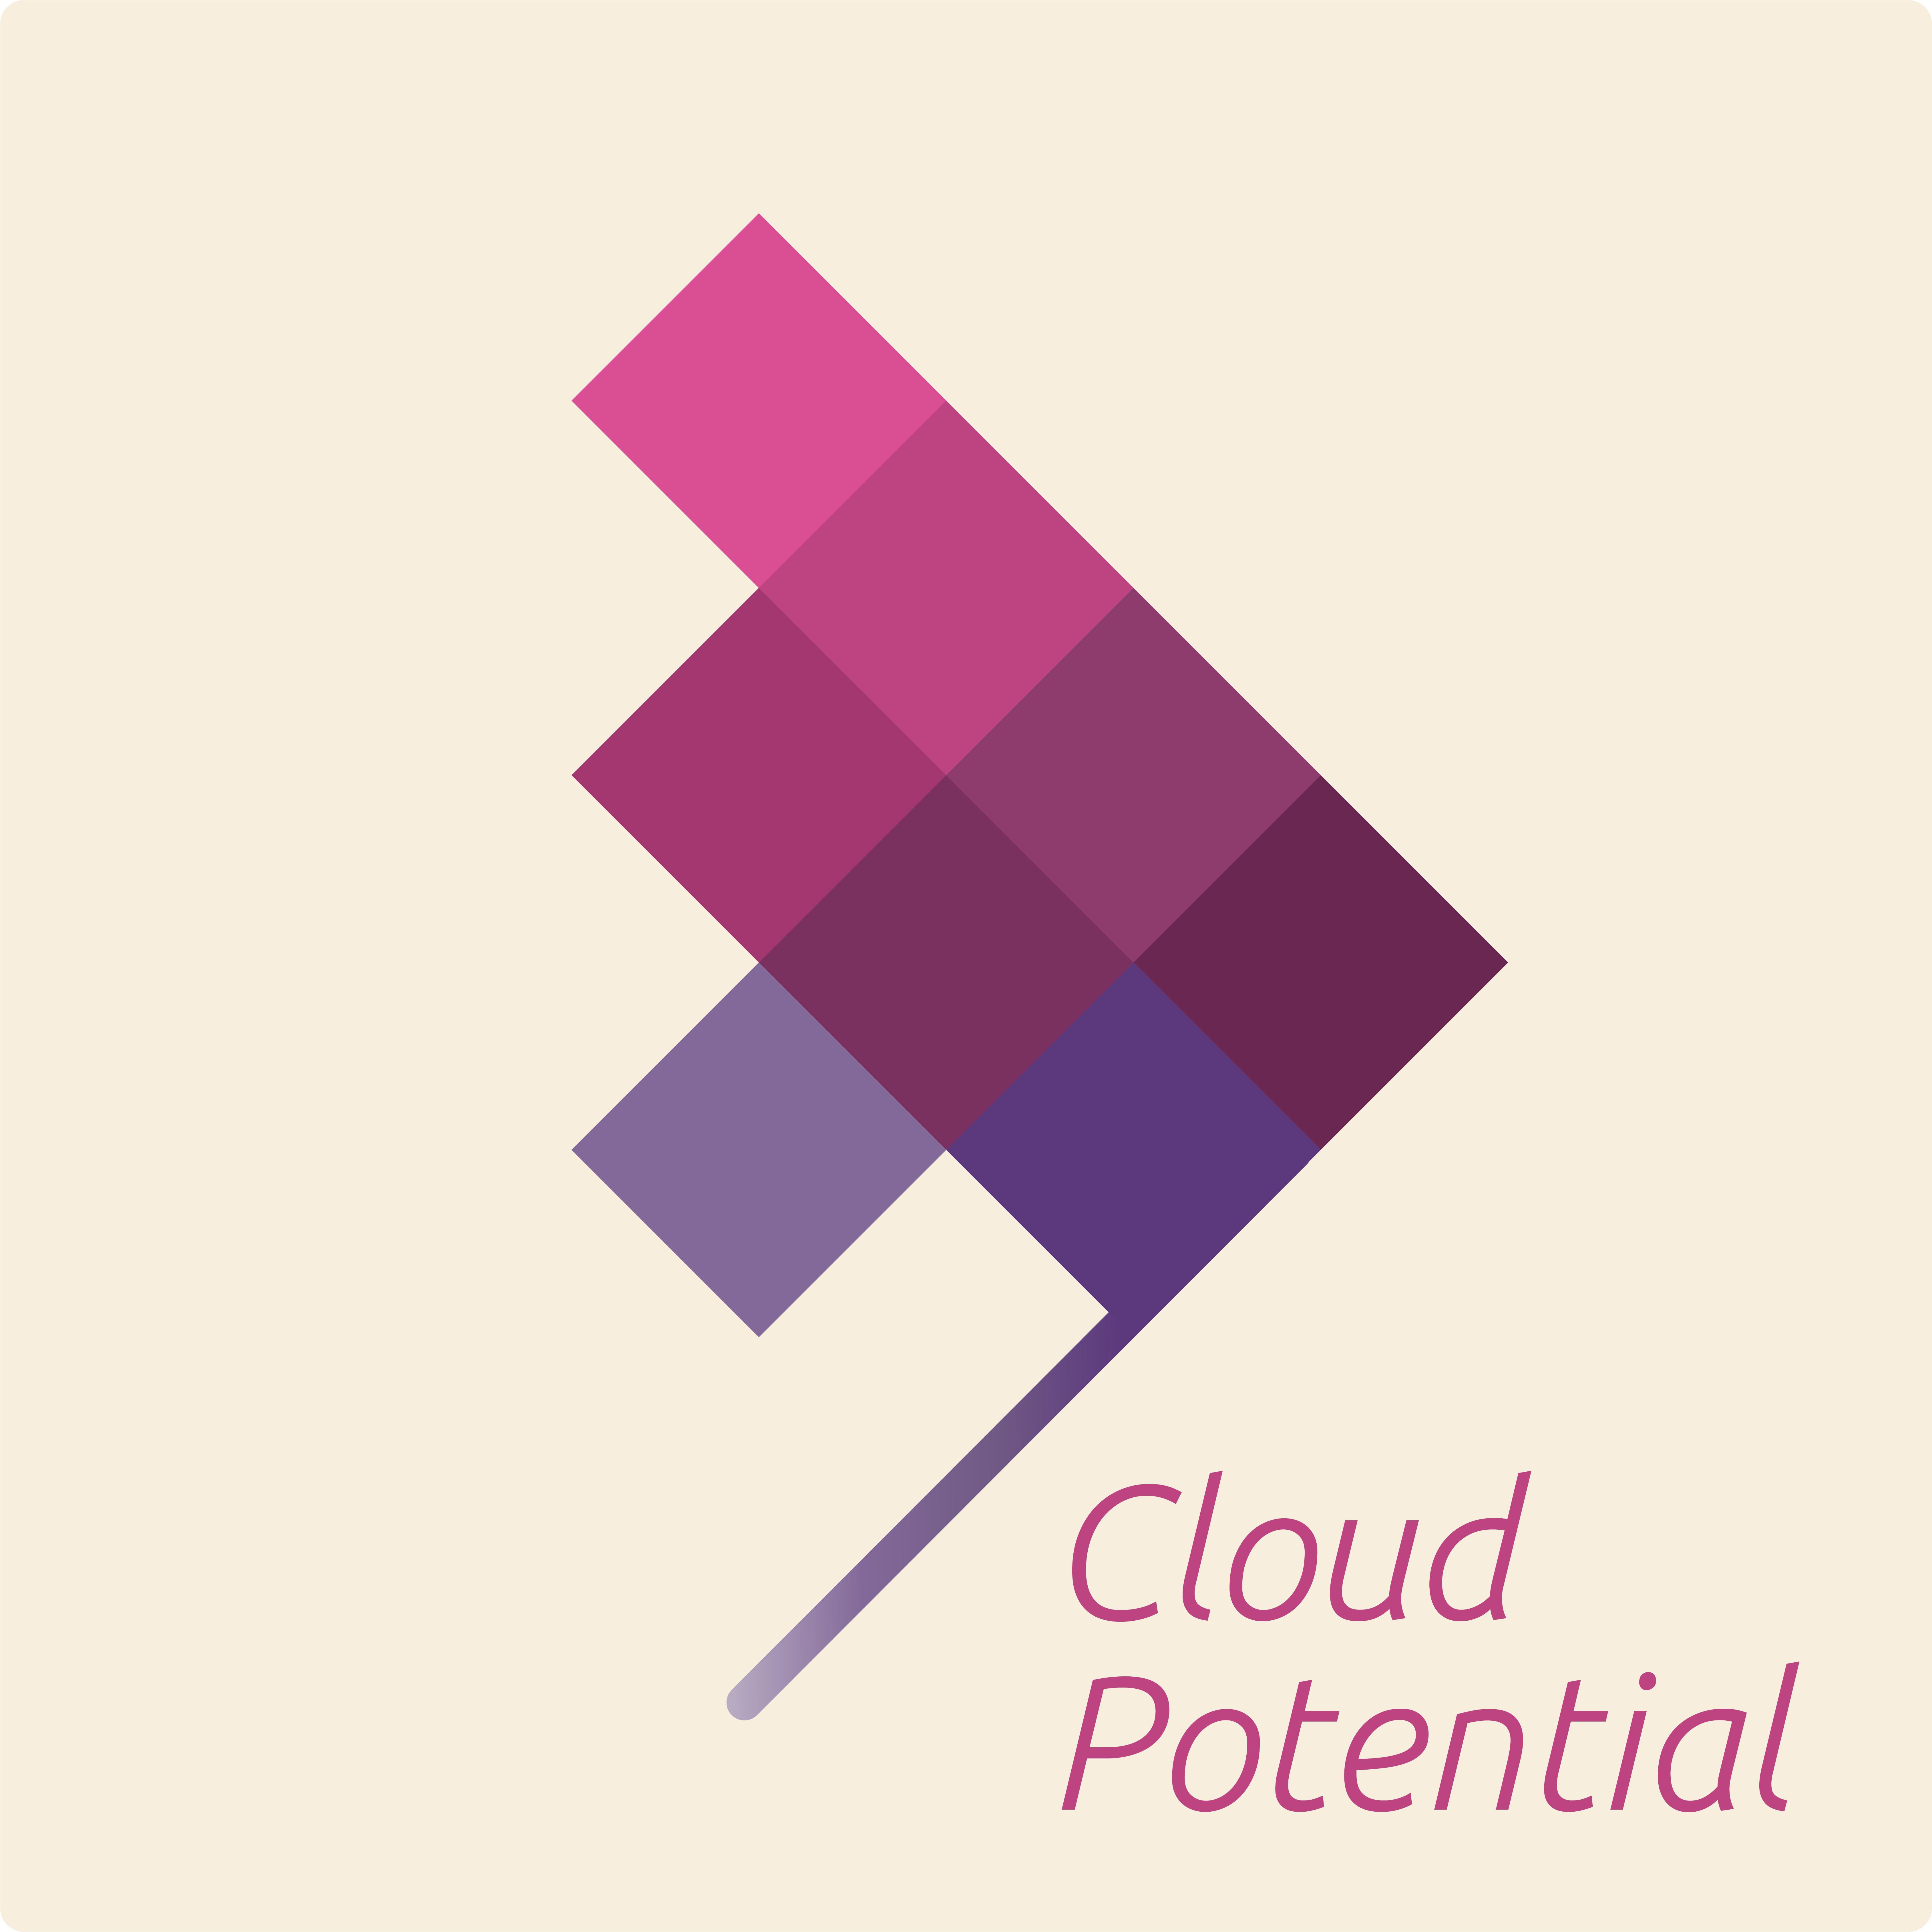 Cloud Potential